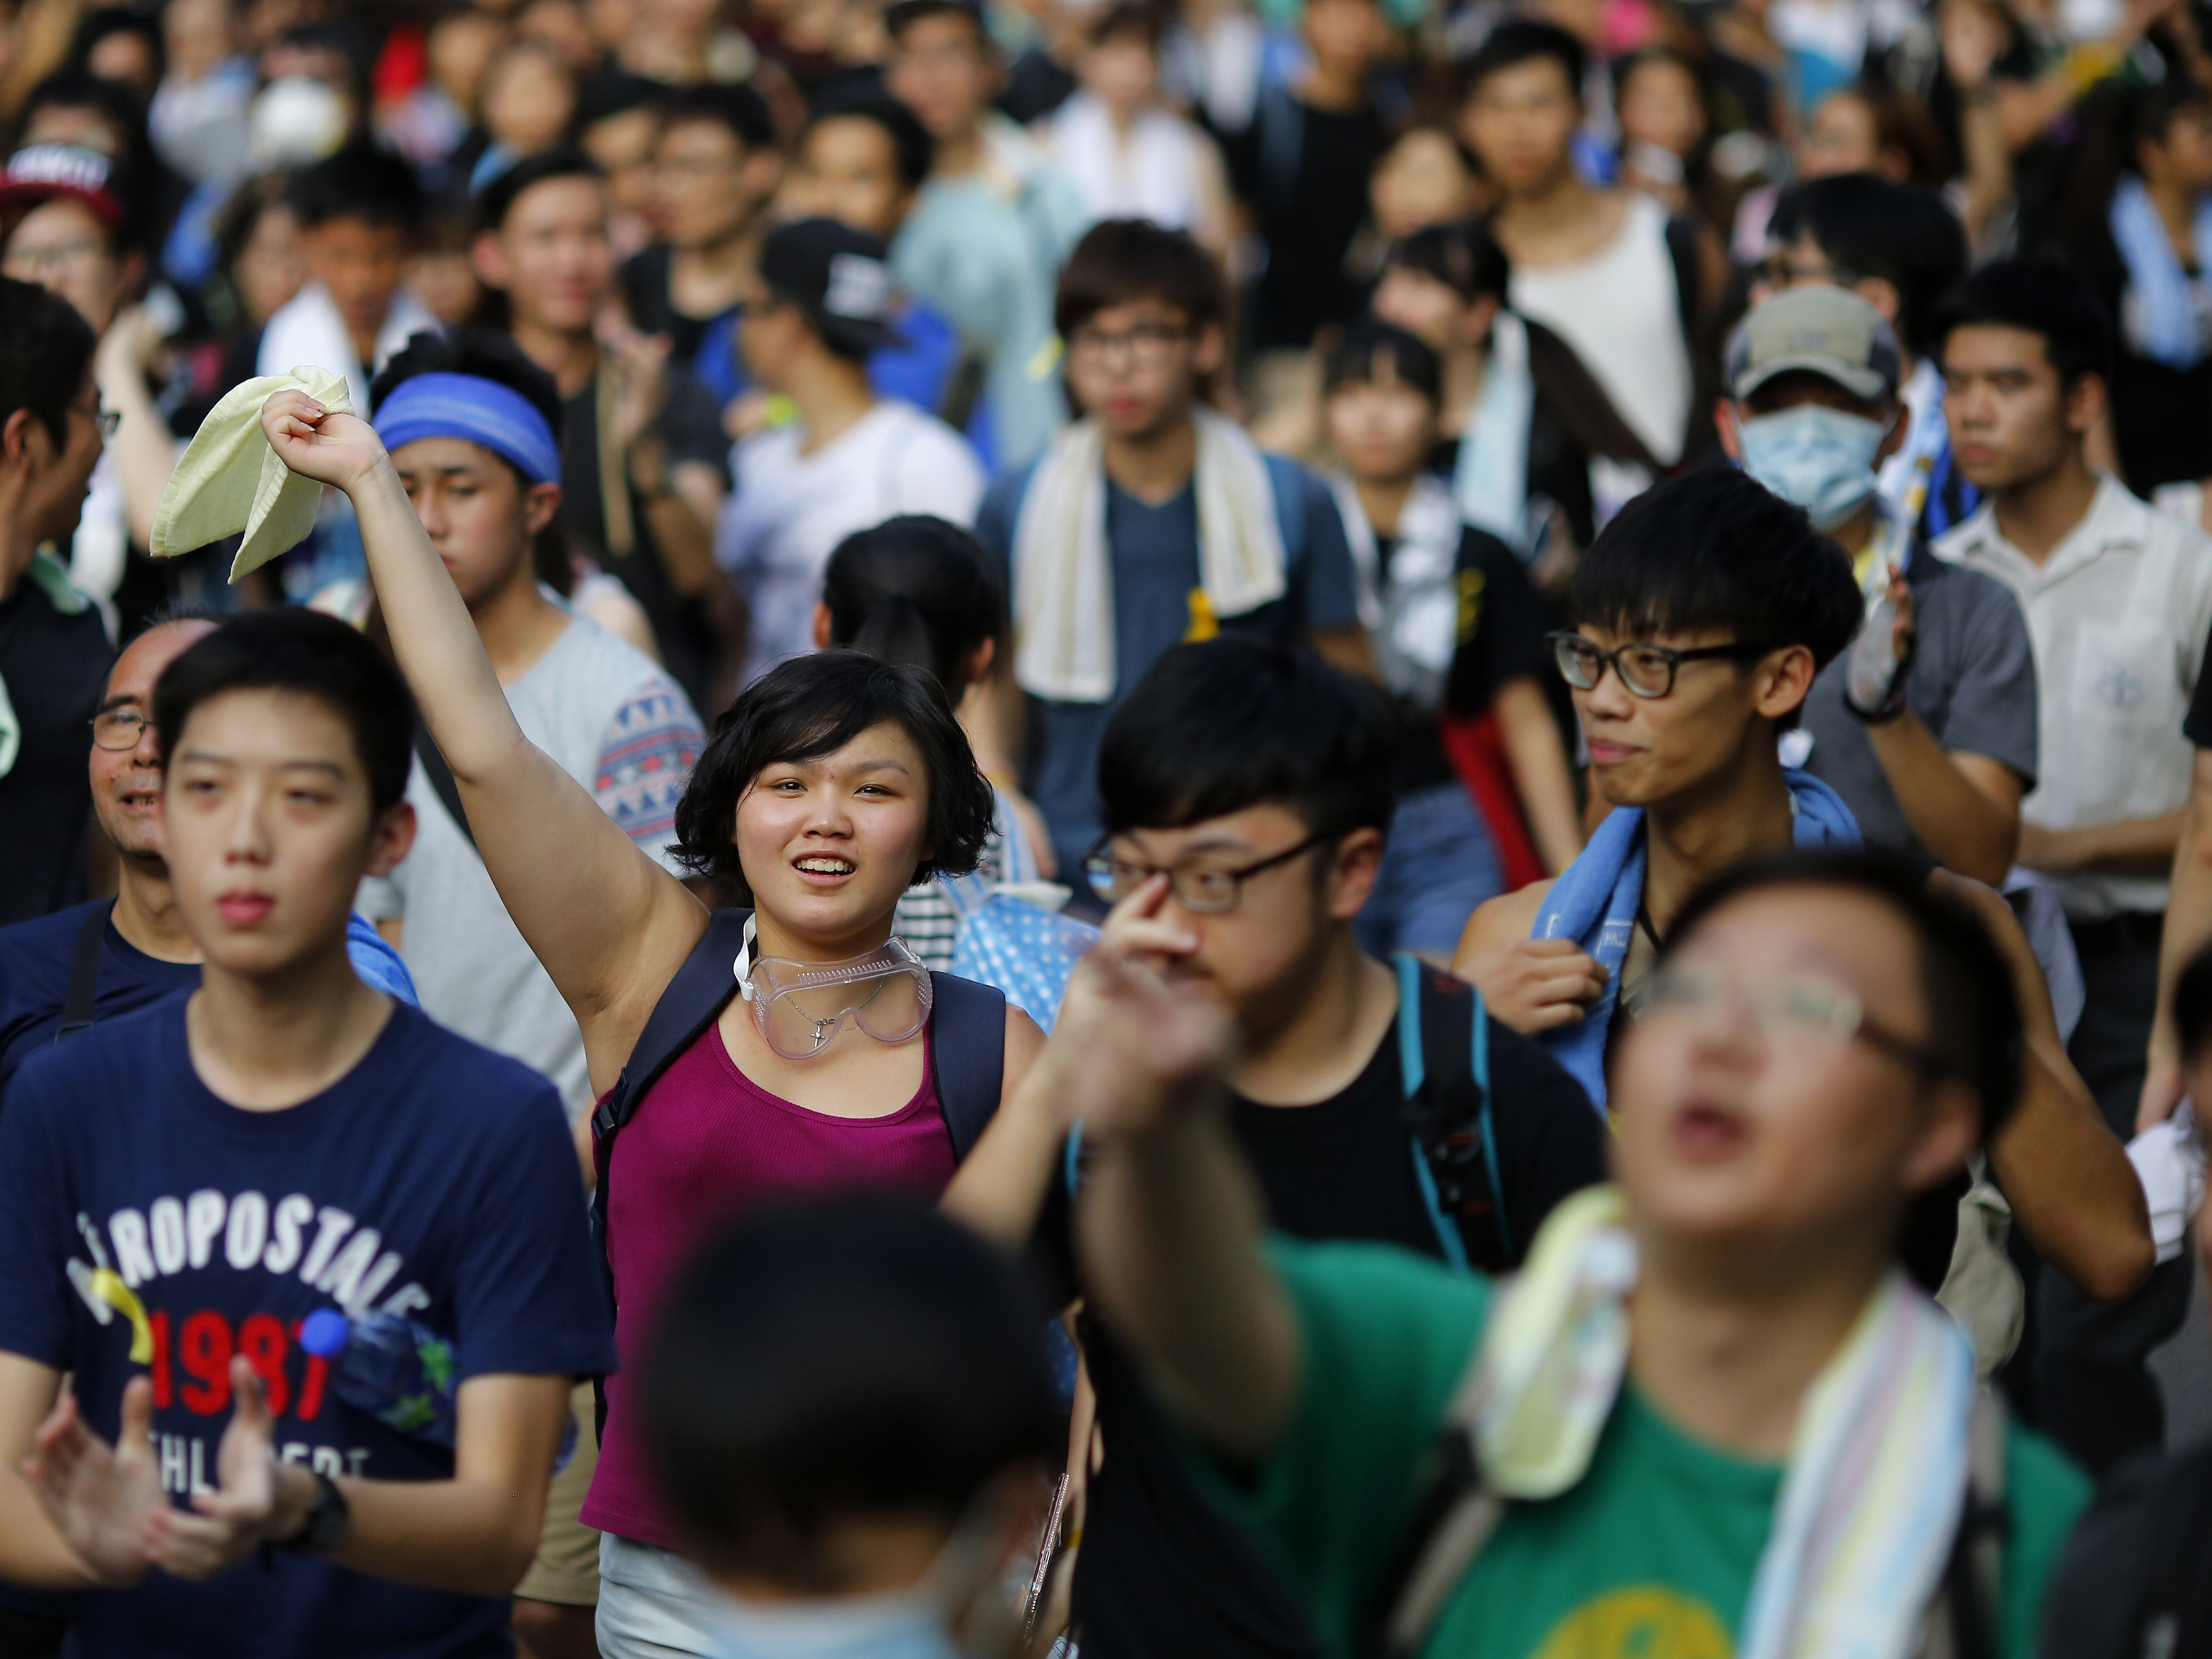 Hong Kong Tense As Democracy Activists Face Down Police